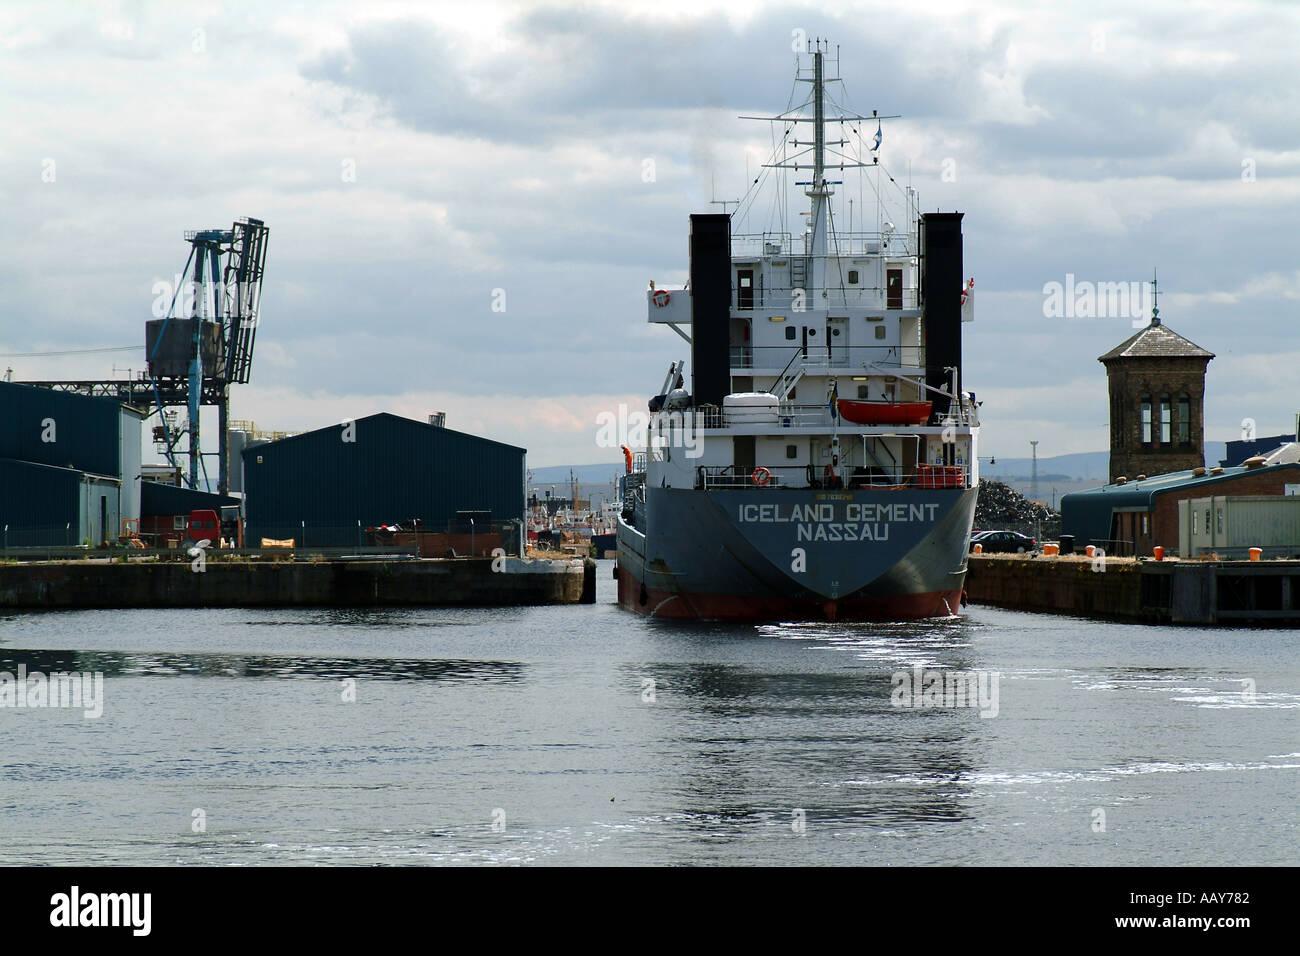 Port of Leith Scotland - Stock Image